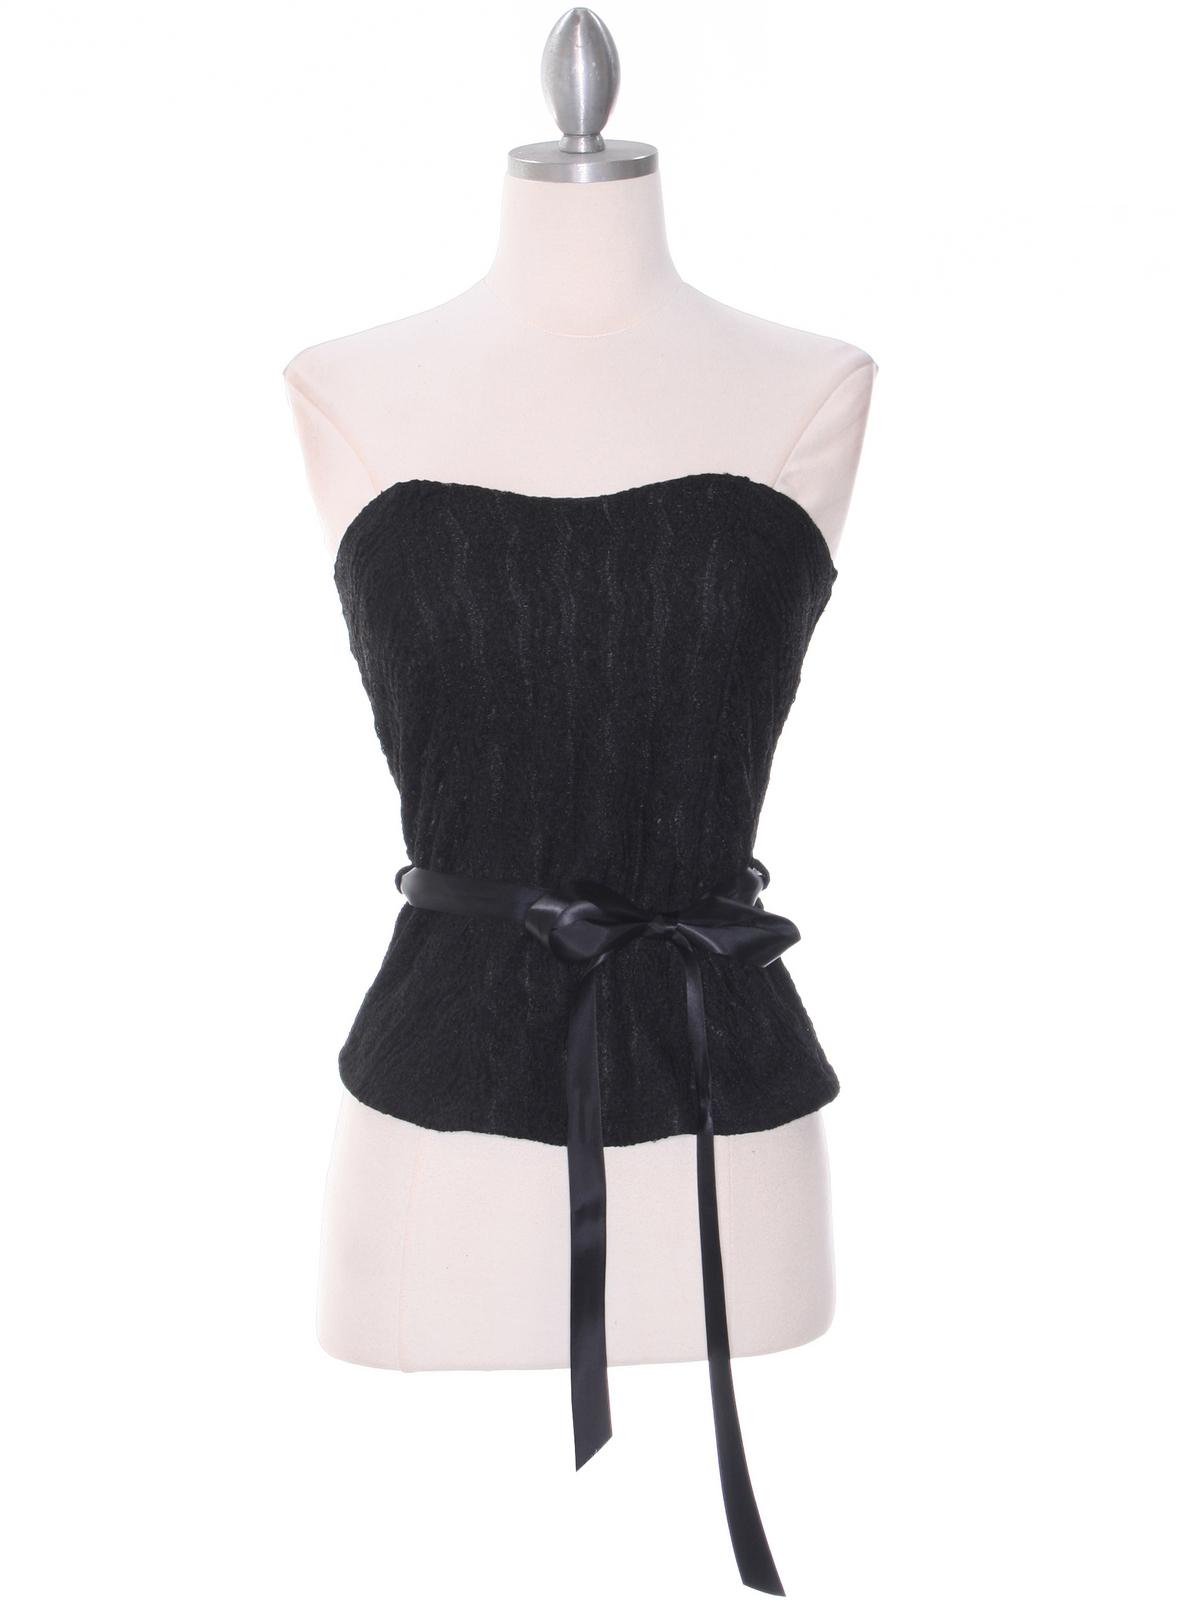 Black Strapless Top